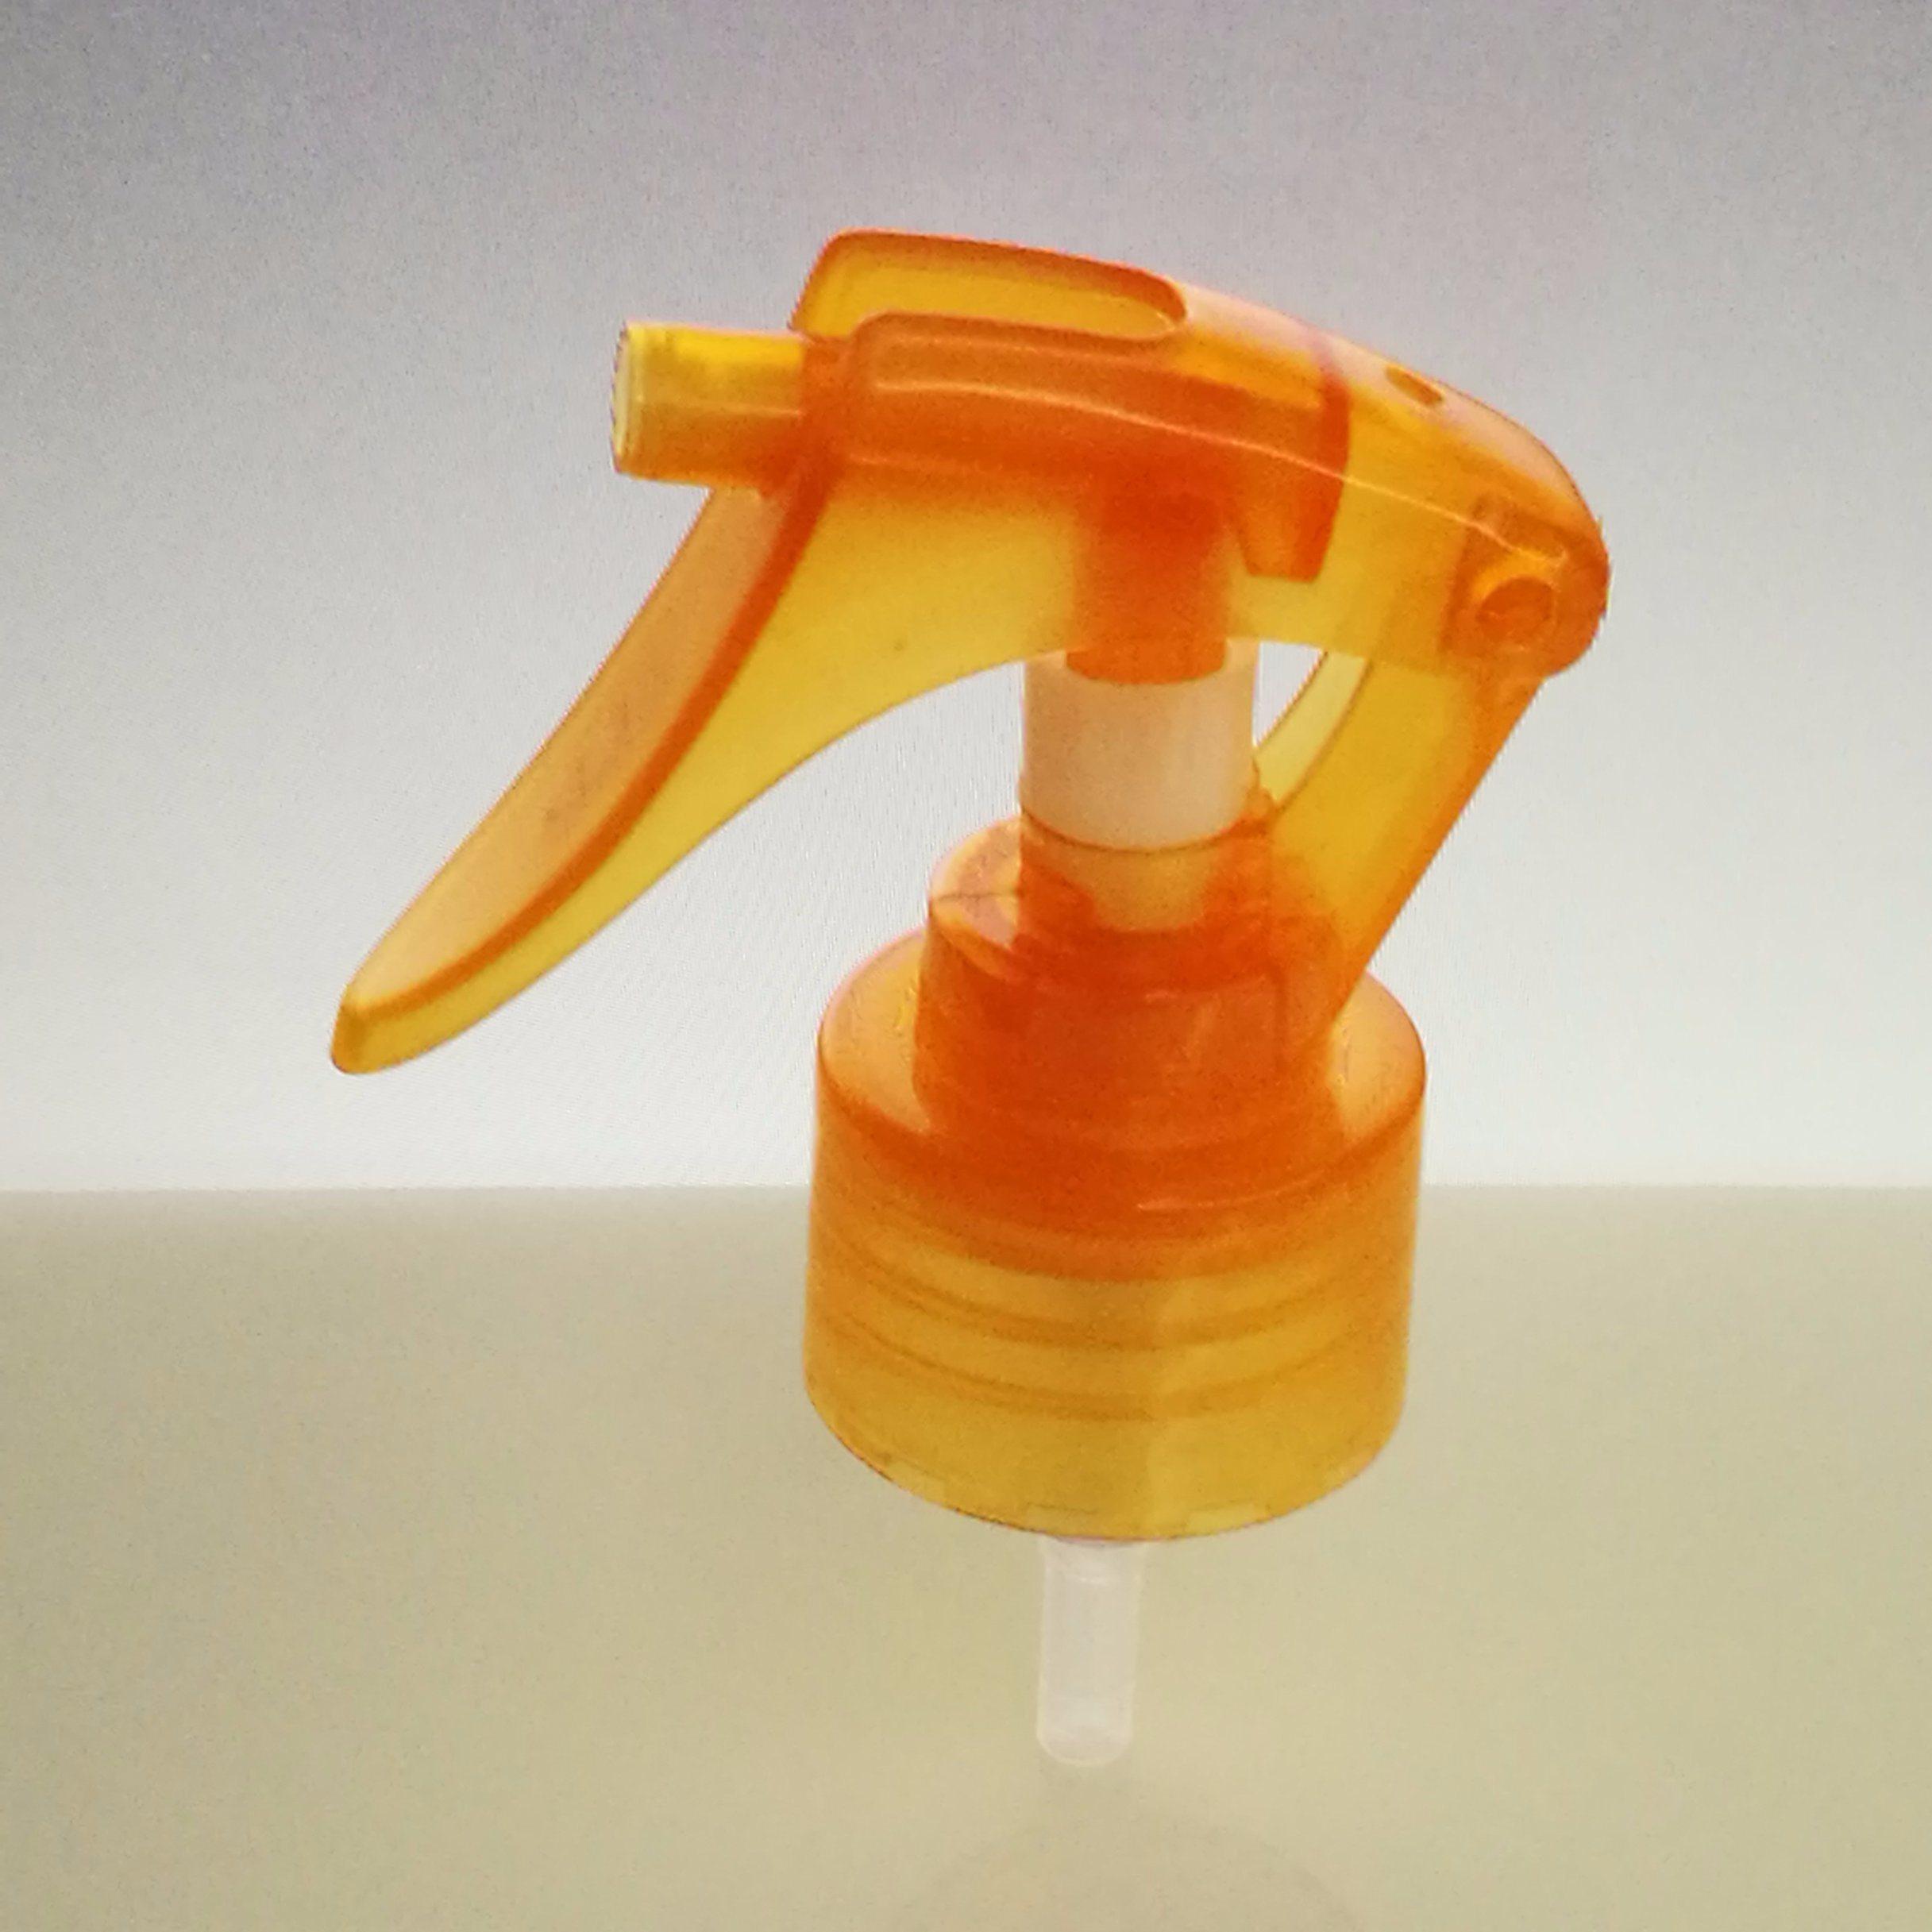 Plastic Mini Hand Triger Sprayer M03 24/410, 28/410